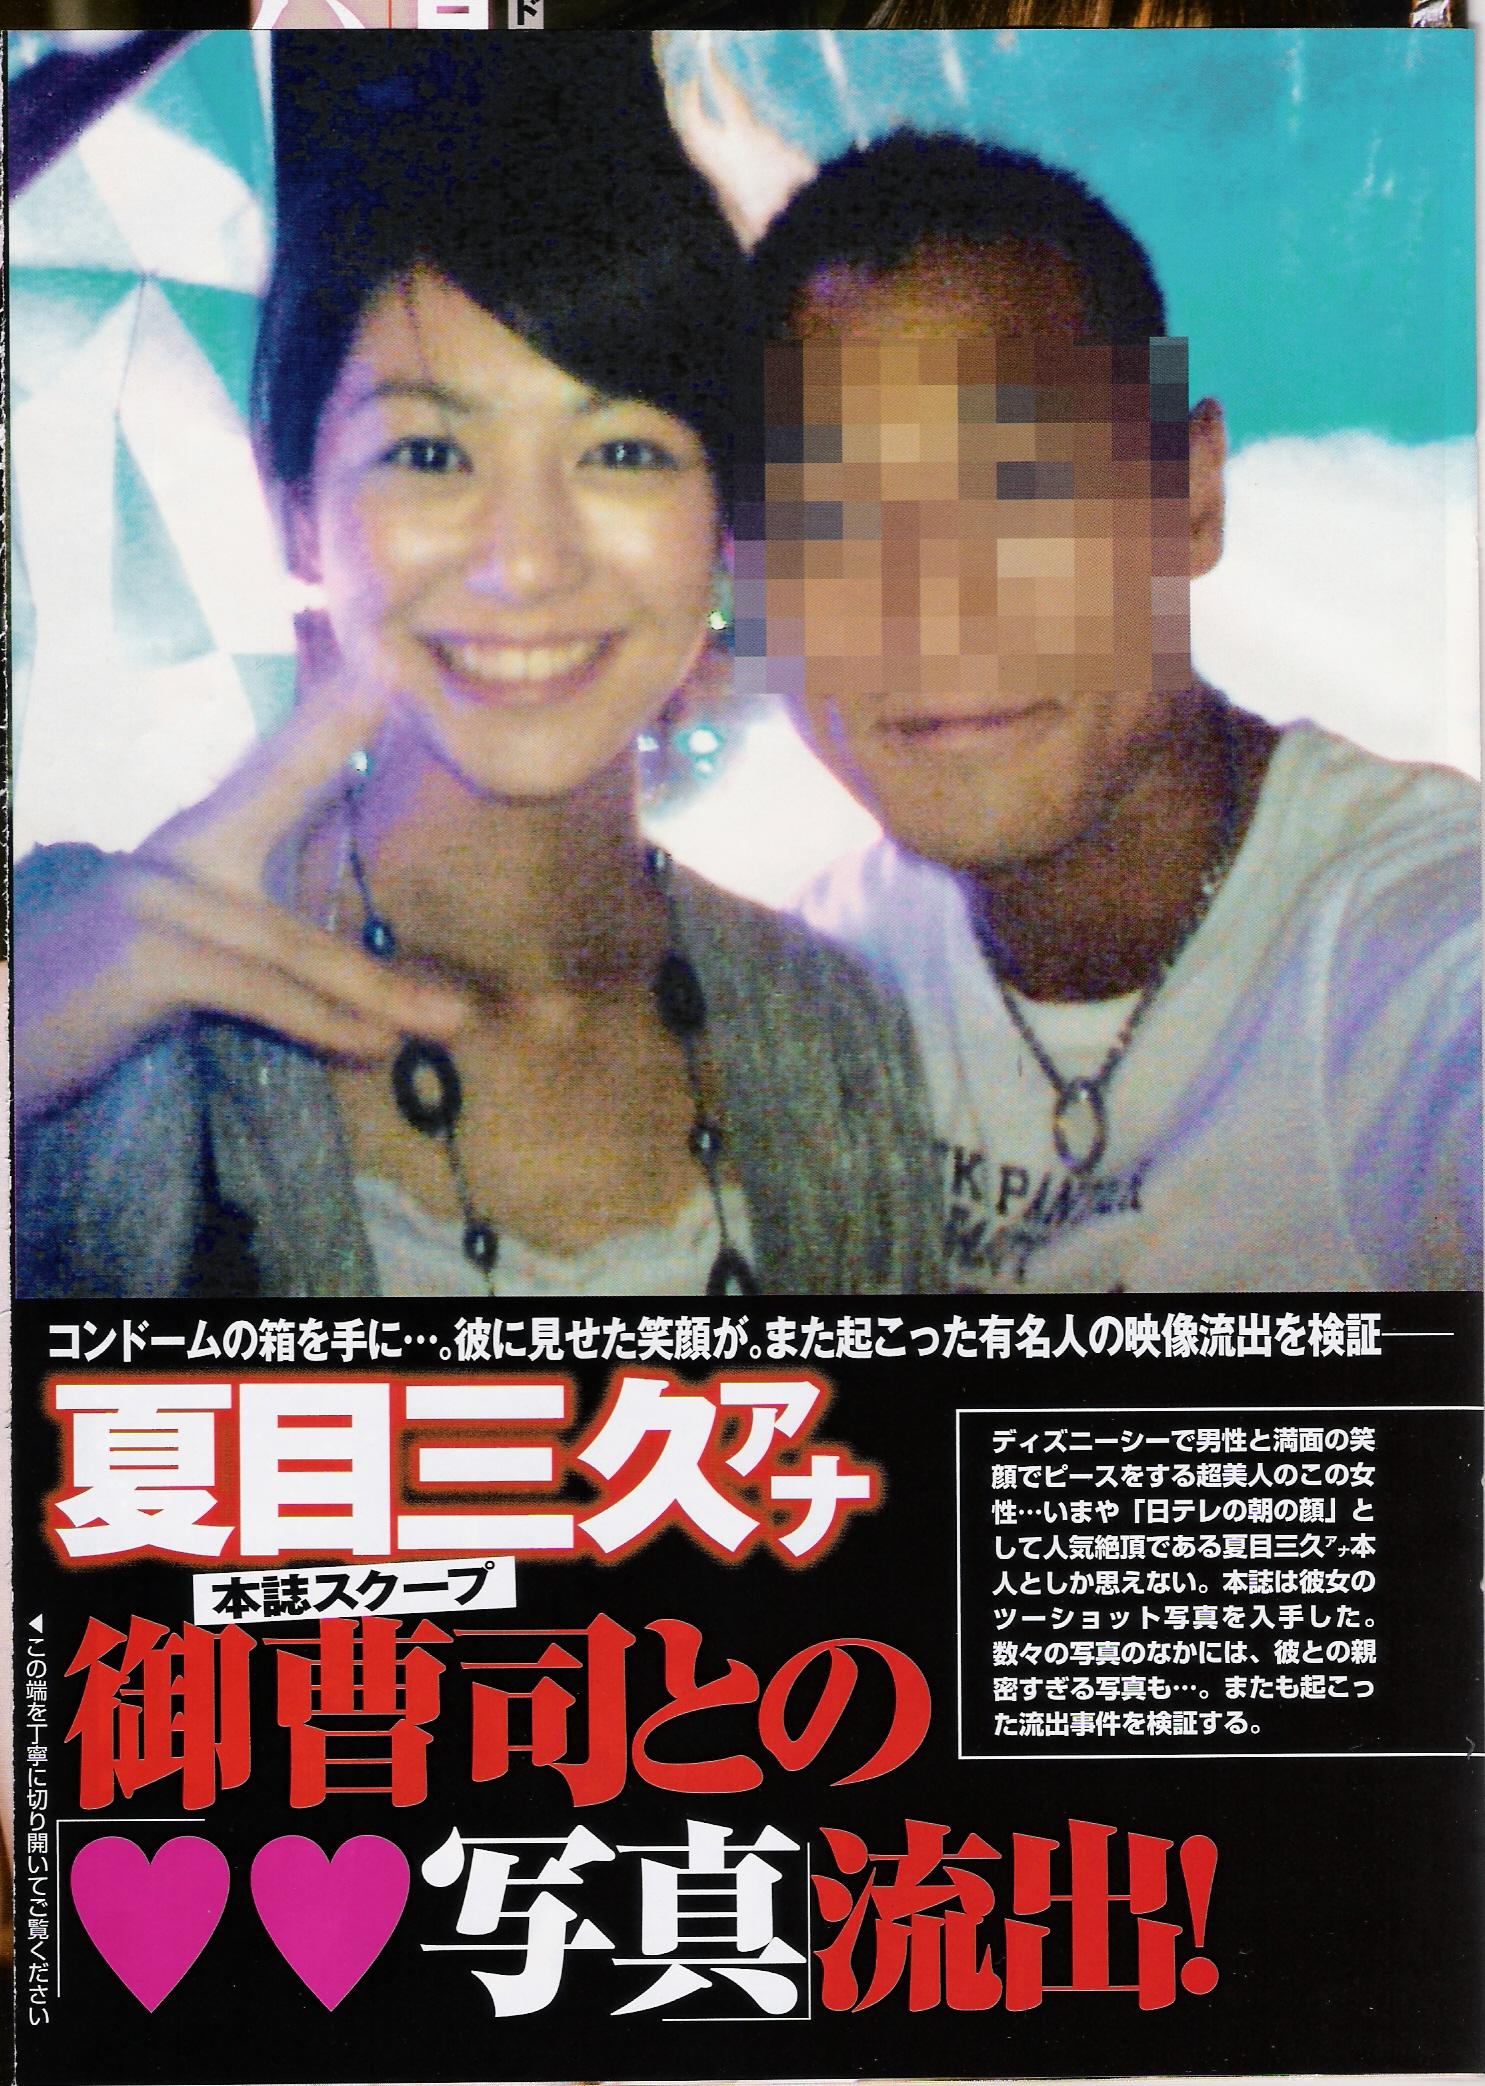 http://livedoor.blogimg.jp/tvmania/imgs/9/e/9ede64a7.jpg